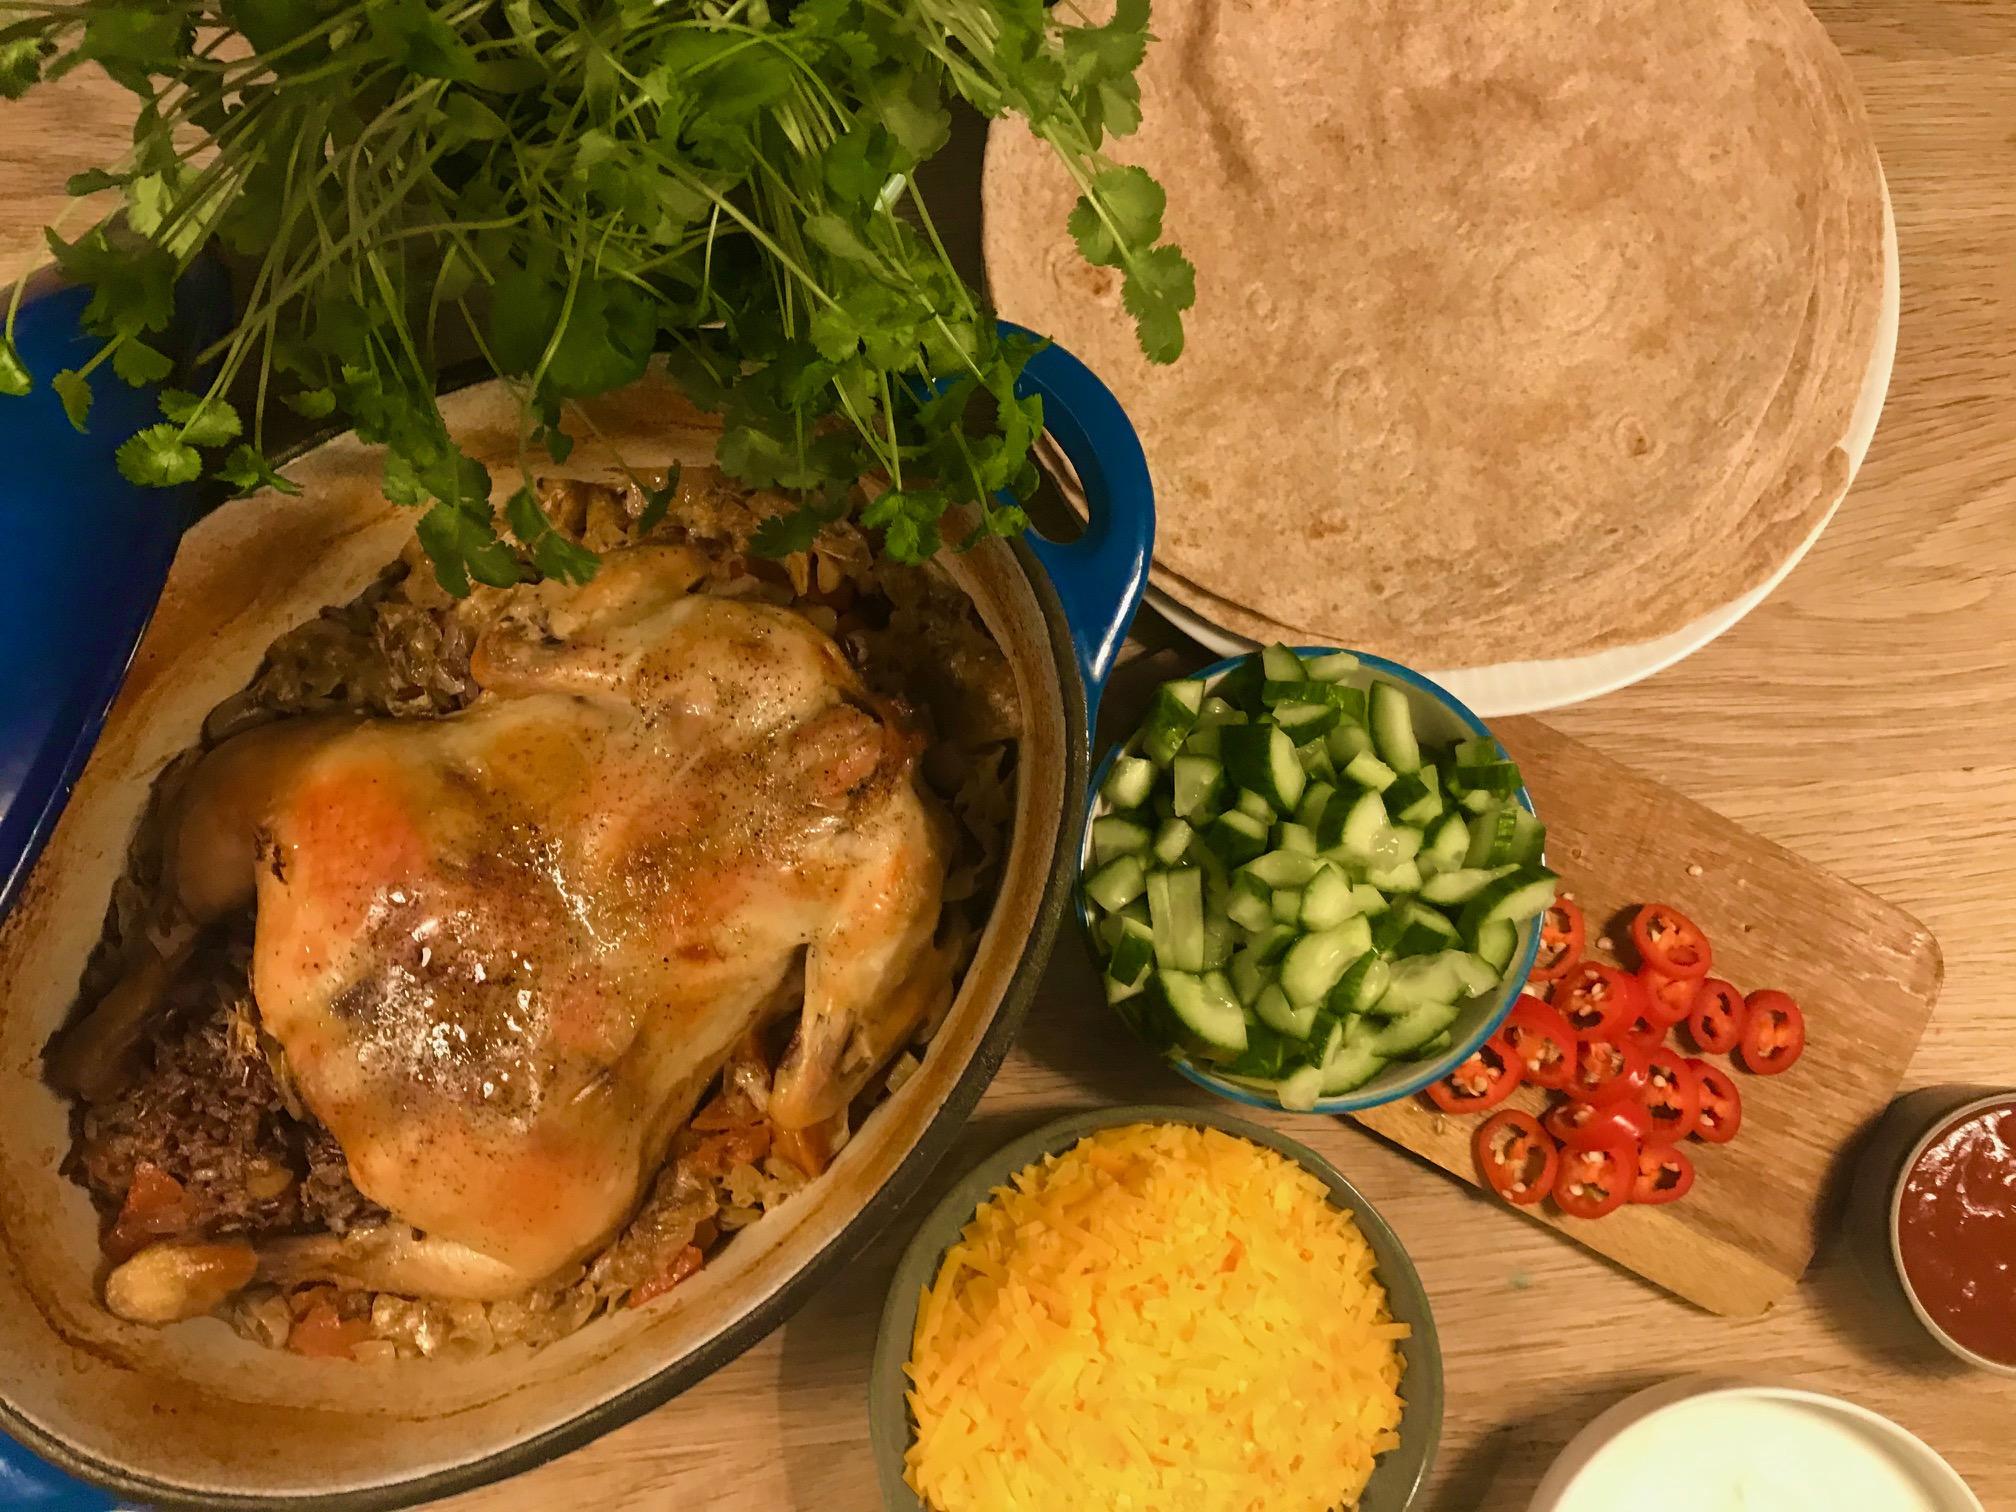 Mexikansk kylling i stegeso